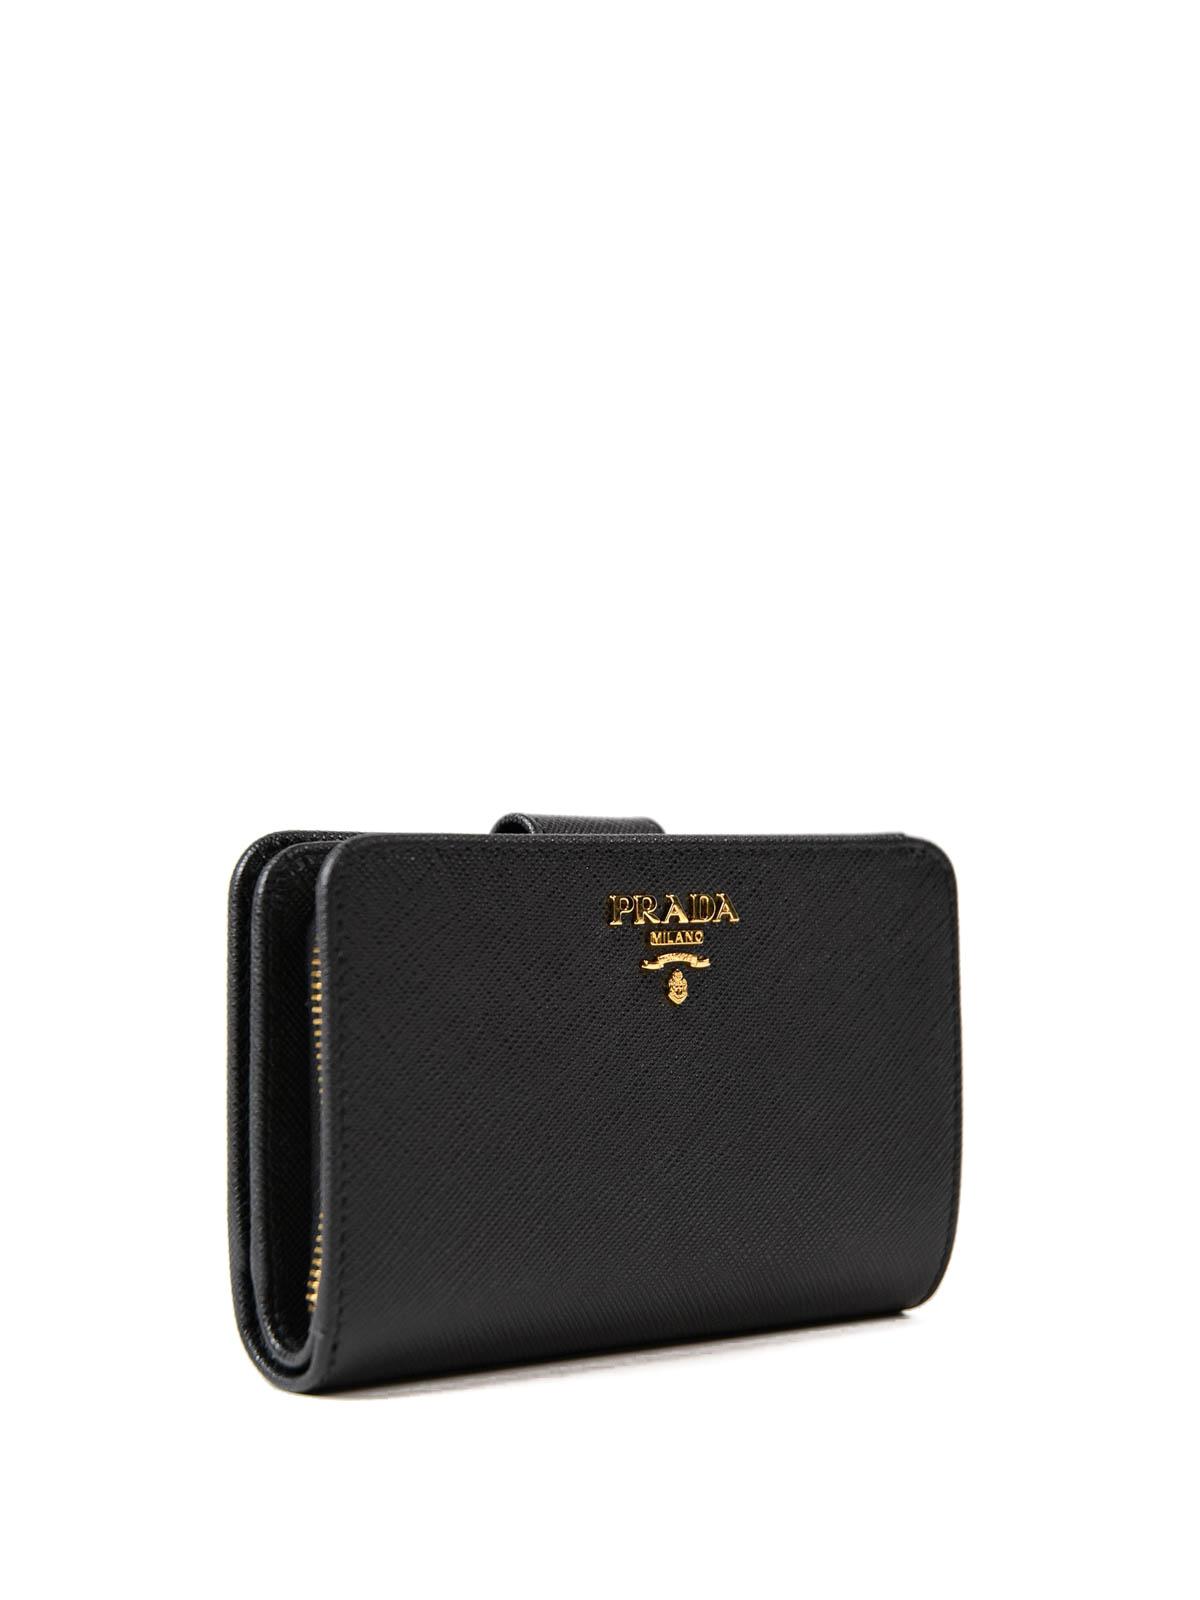 155c0c0640e7 PRADA  wallets   purses online - Black saffiano leather French wallet